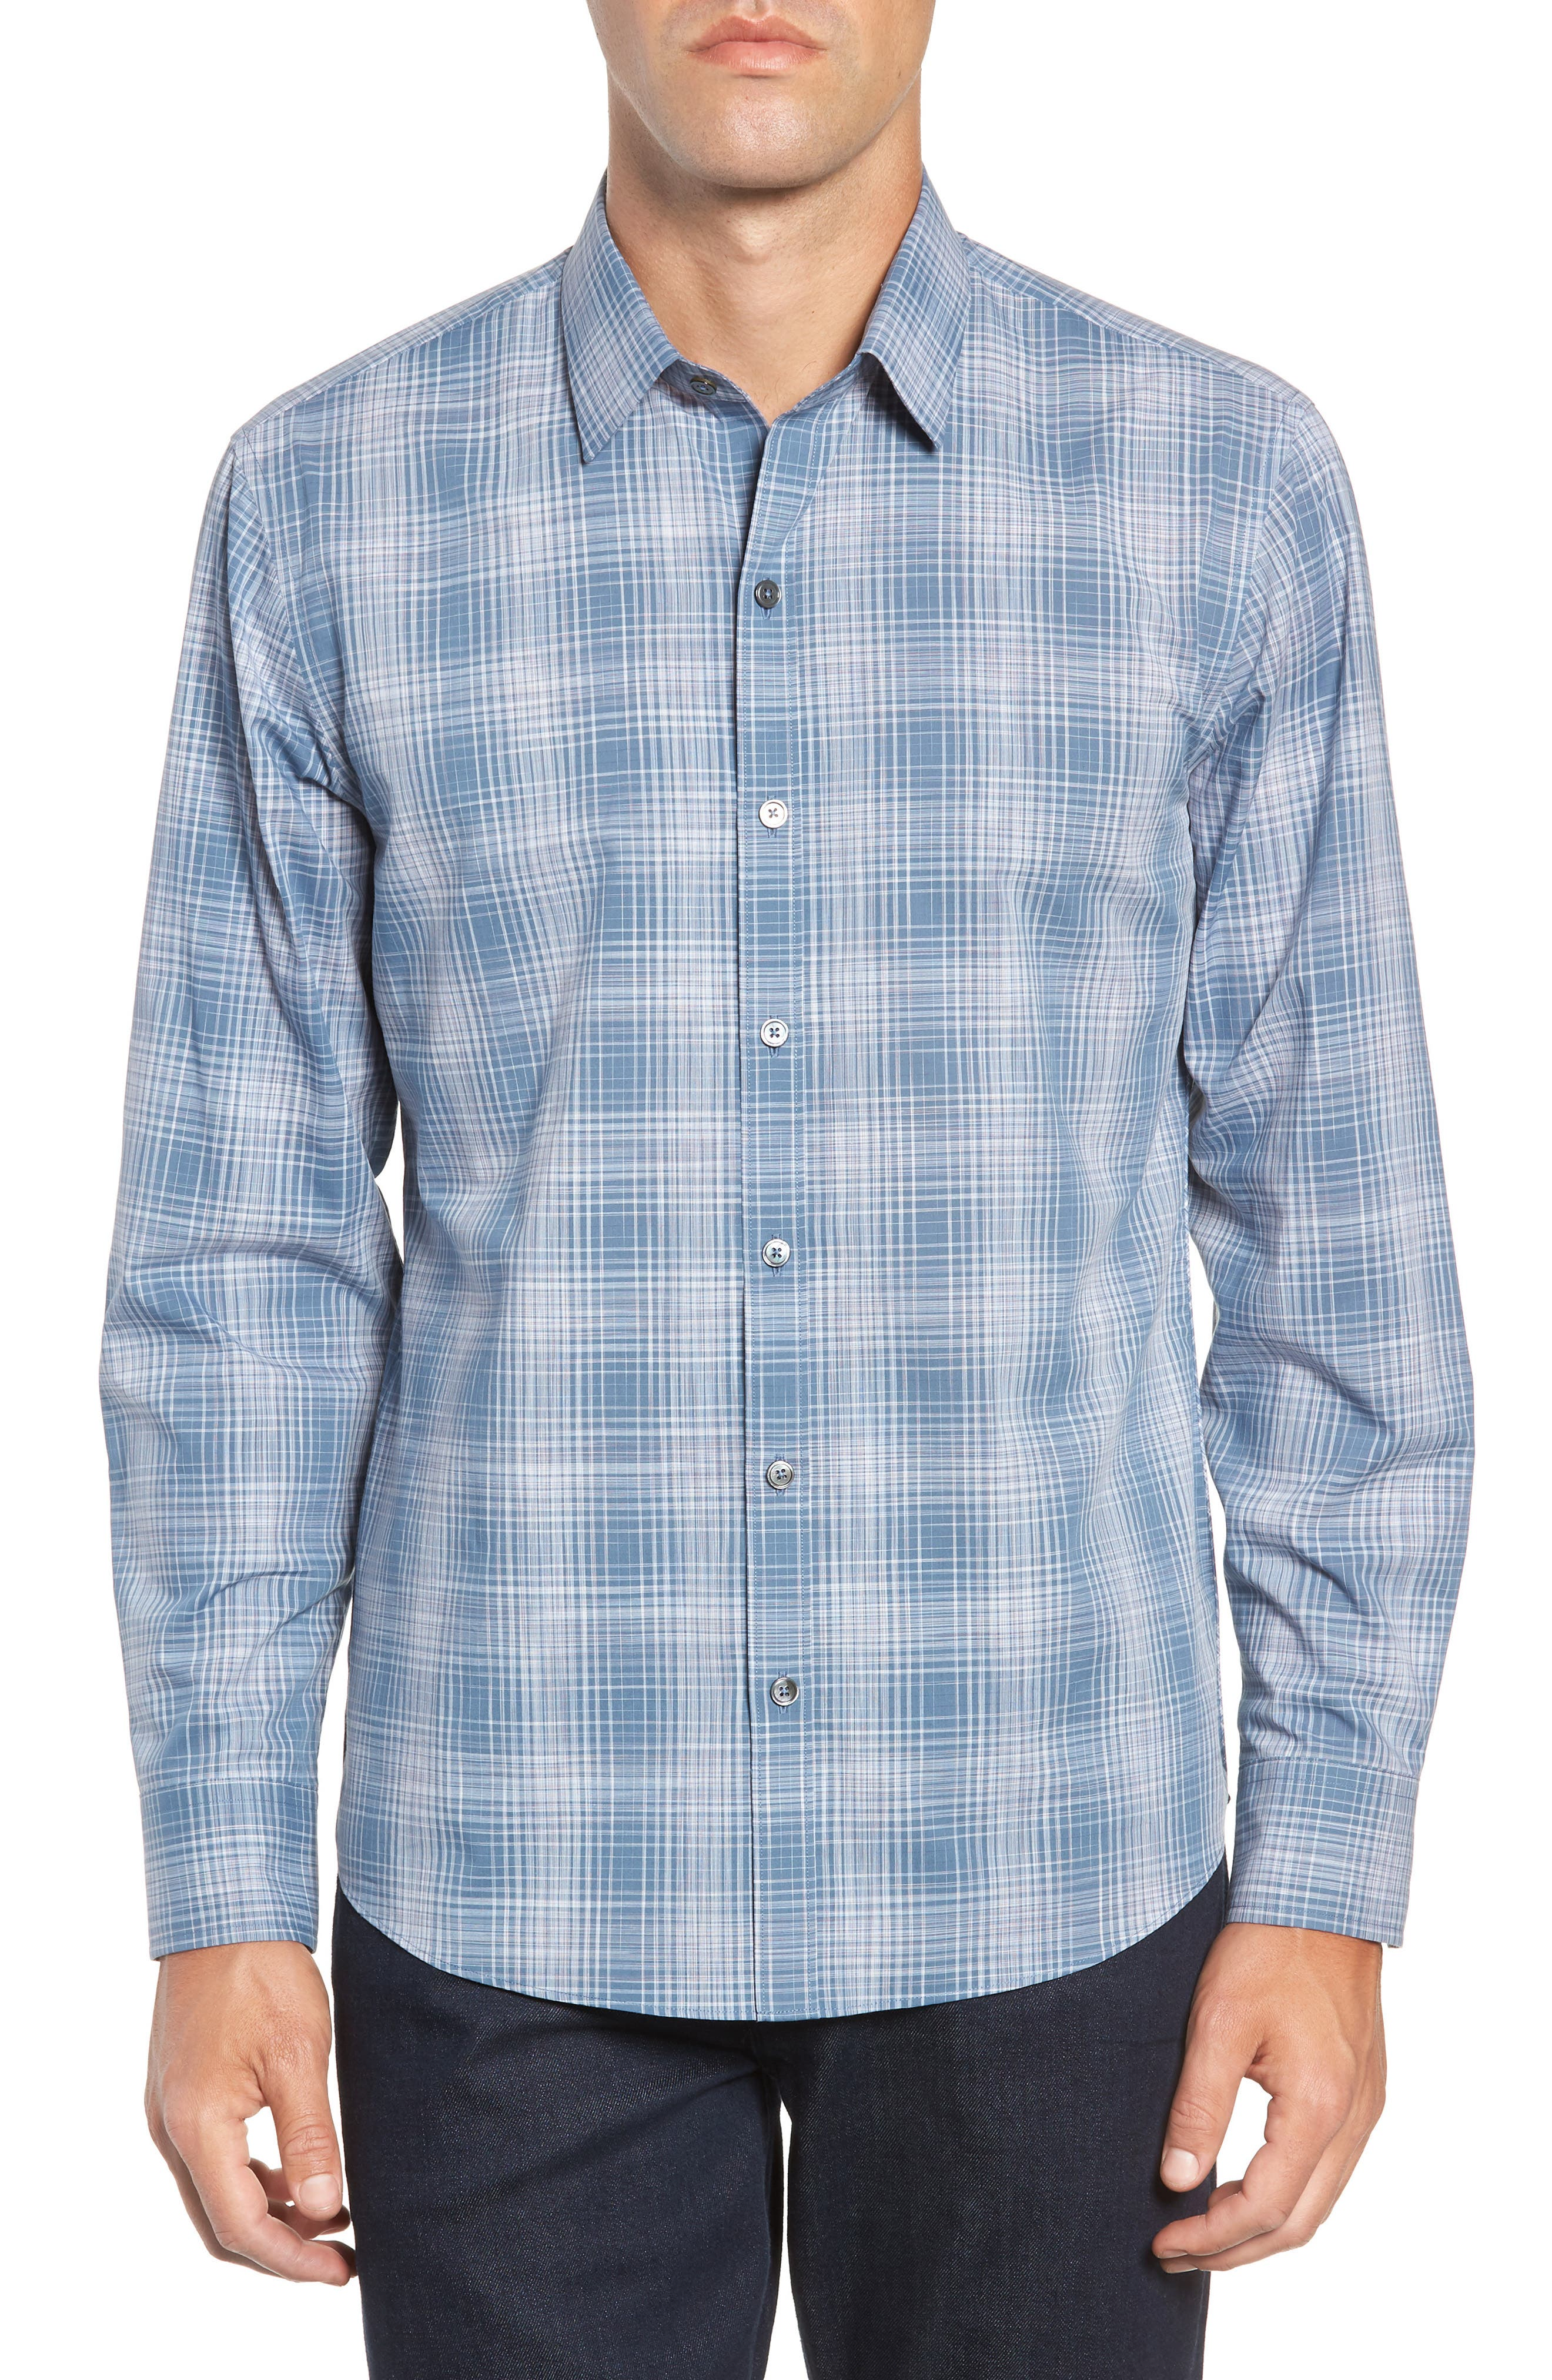 Slater Check Sport Shirt,                         Main,                         color, PALE BLUE